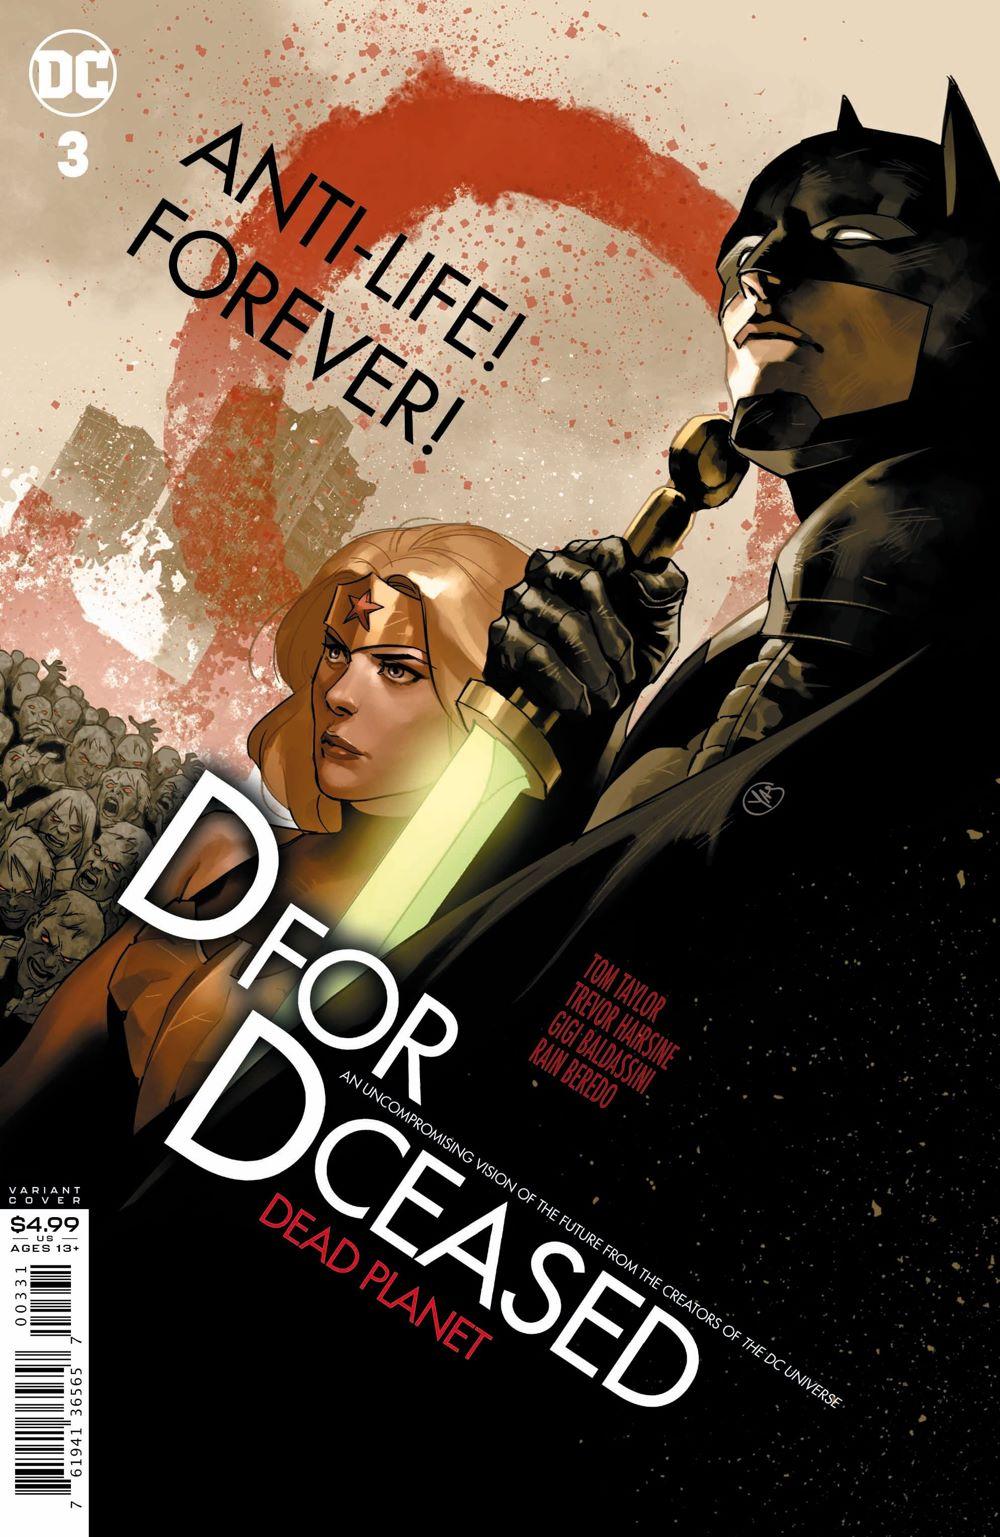 DCeased-DEADPLANET-Cv3-homage ComicList Previews: DCEASED DEAD PLANET #3